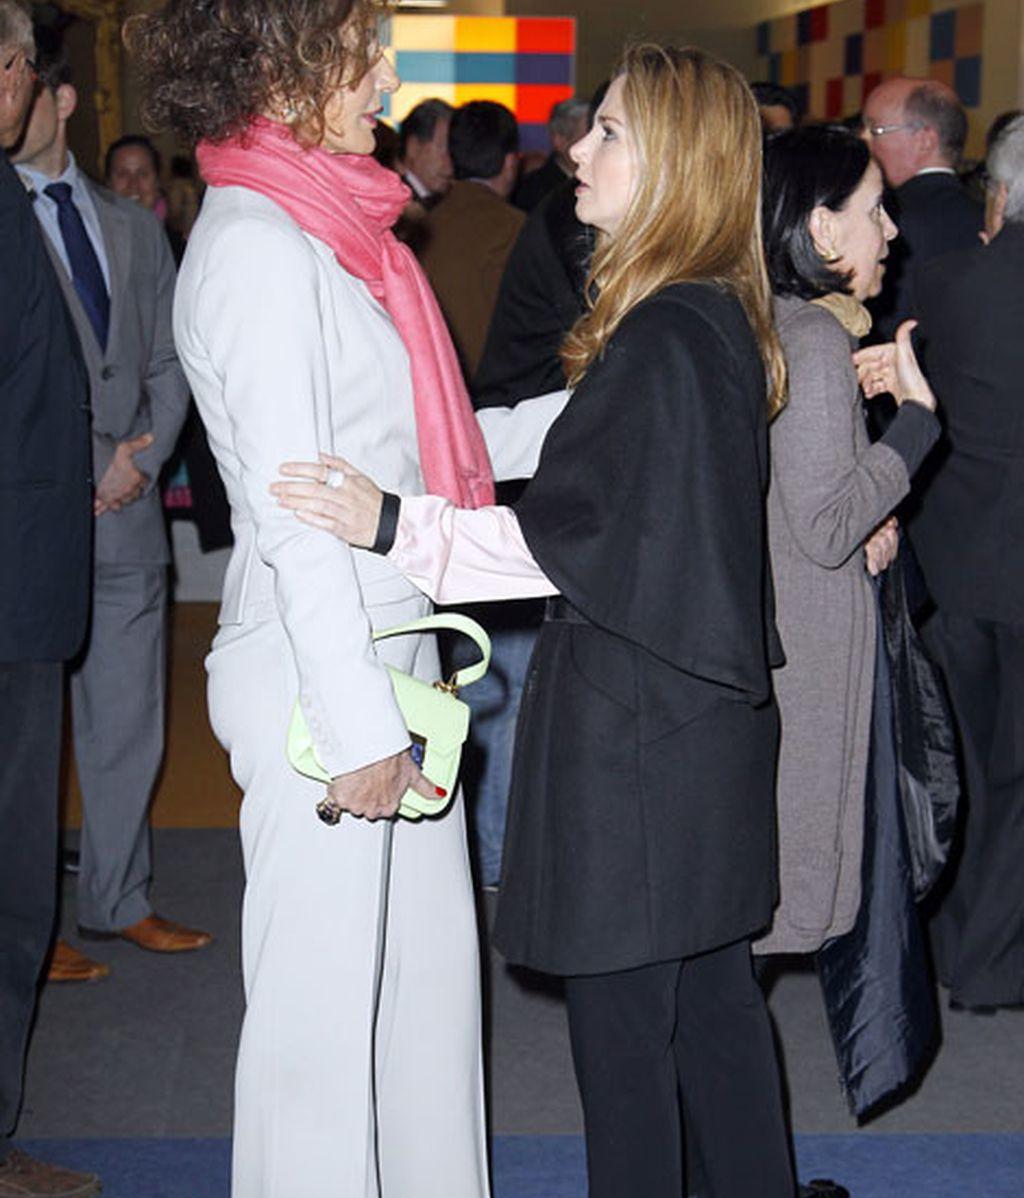 Nati y Genoveva: yo te toco, tú me tocas